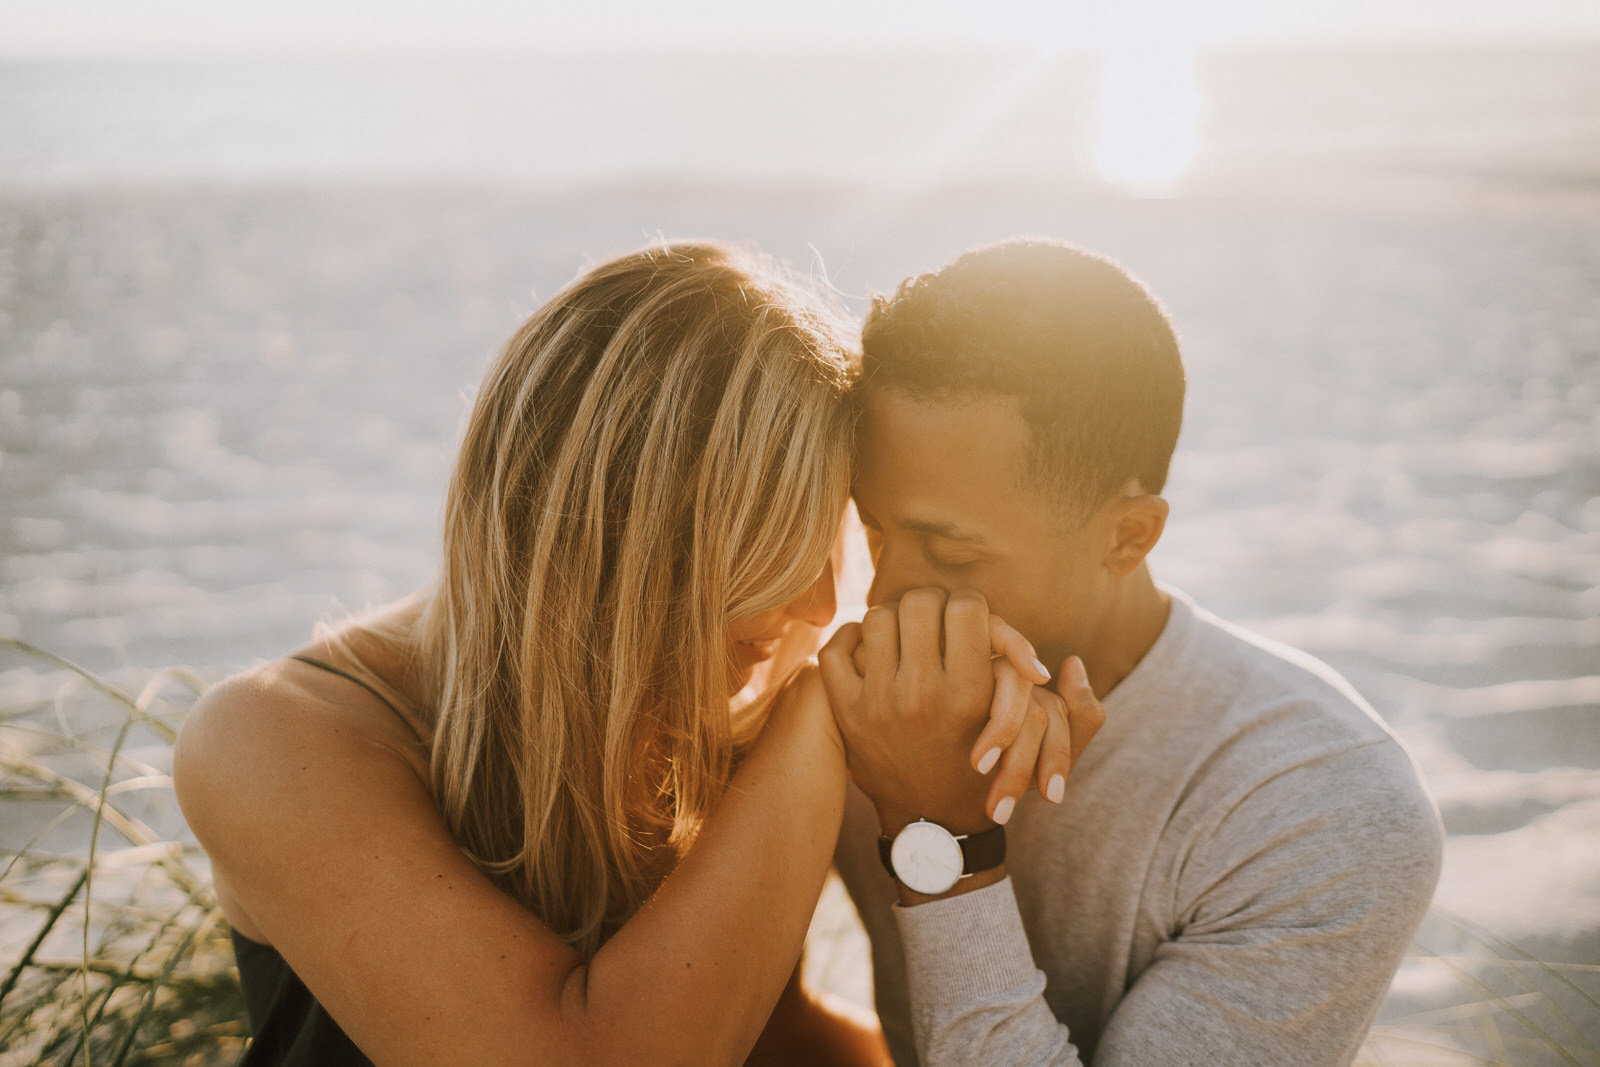 Naples 5th Ave Engagement Photos- Michelle Gonzalez Photography- Michele + Troy-257.JPG